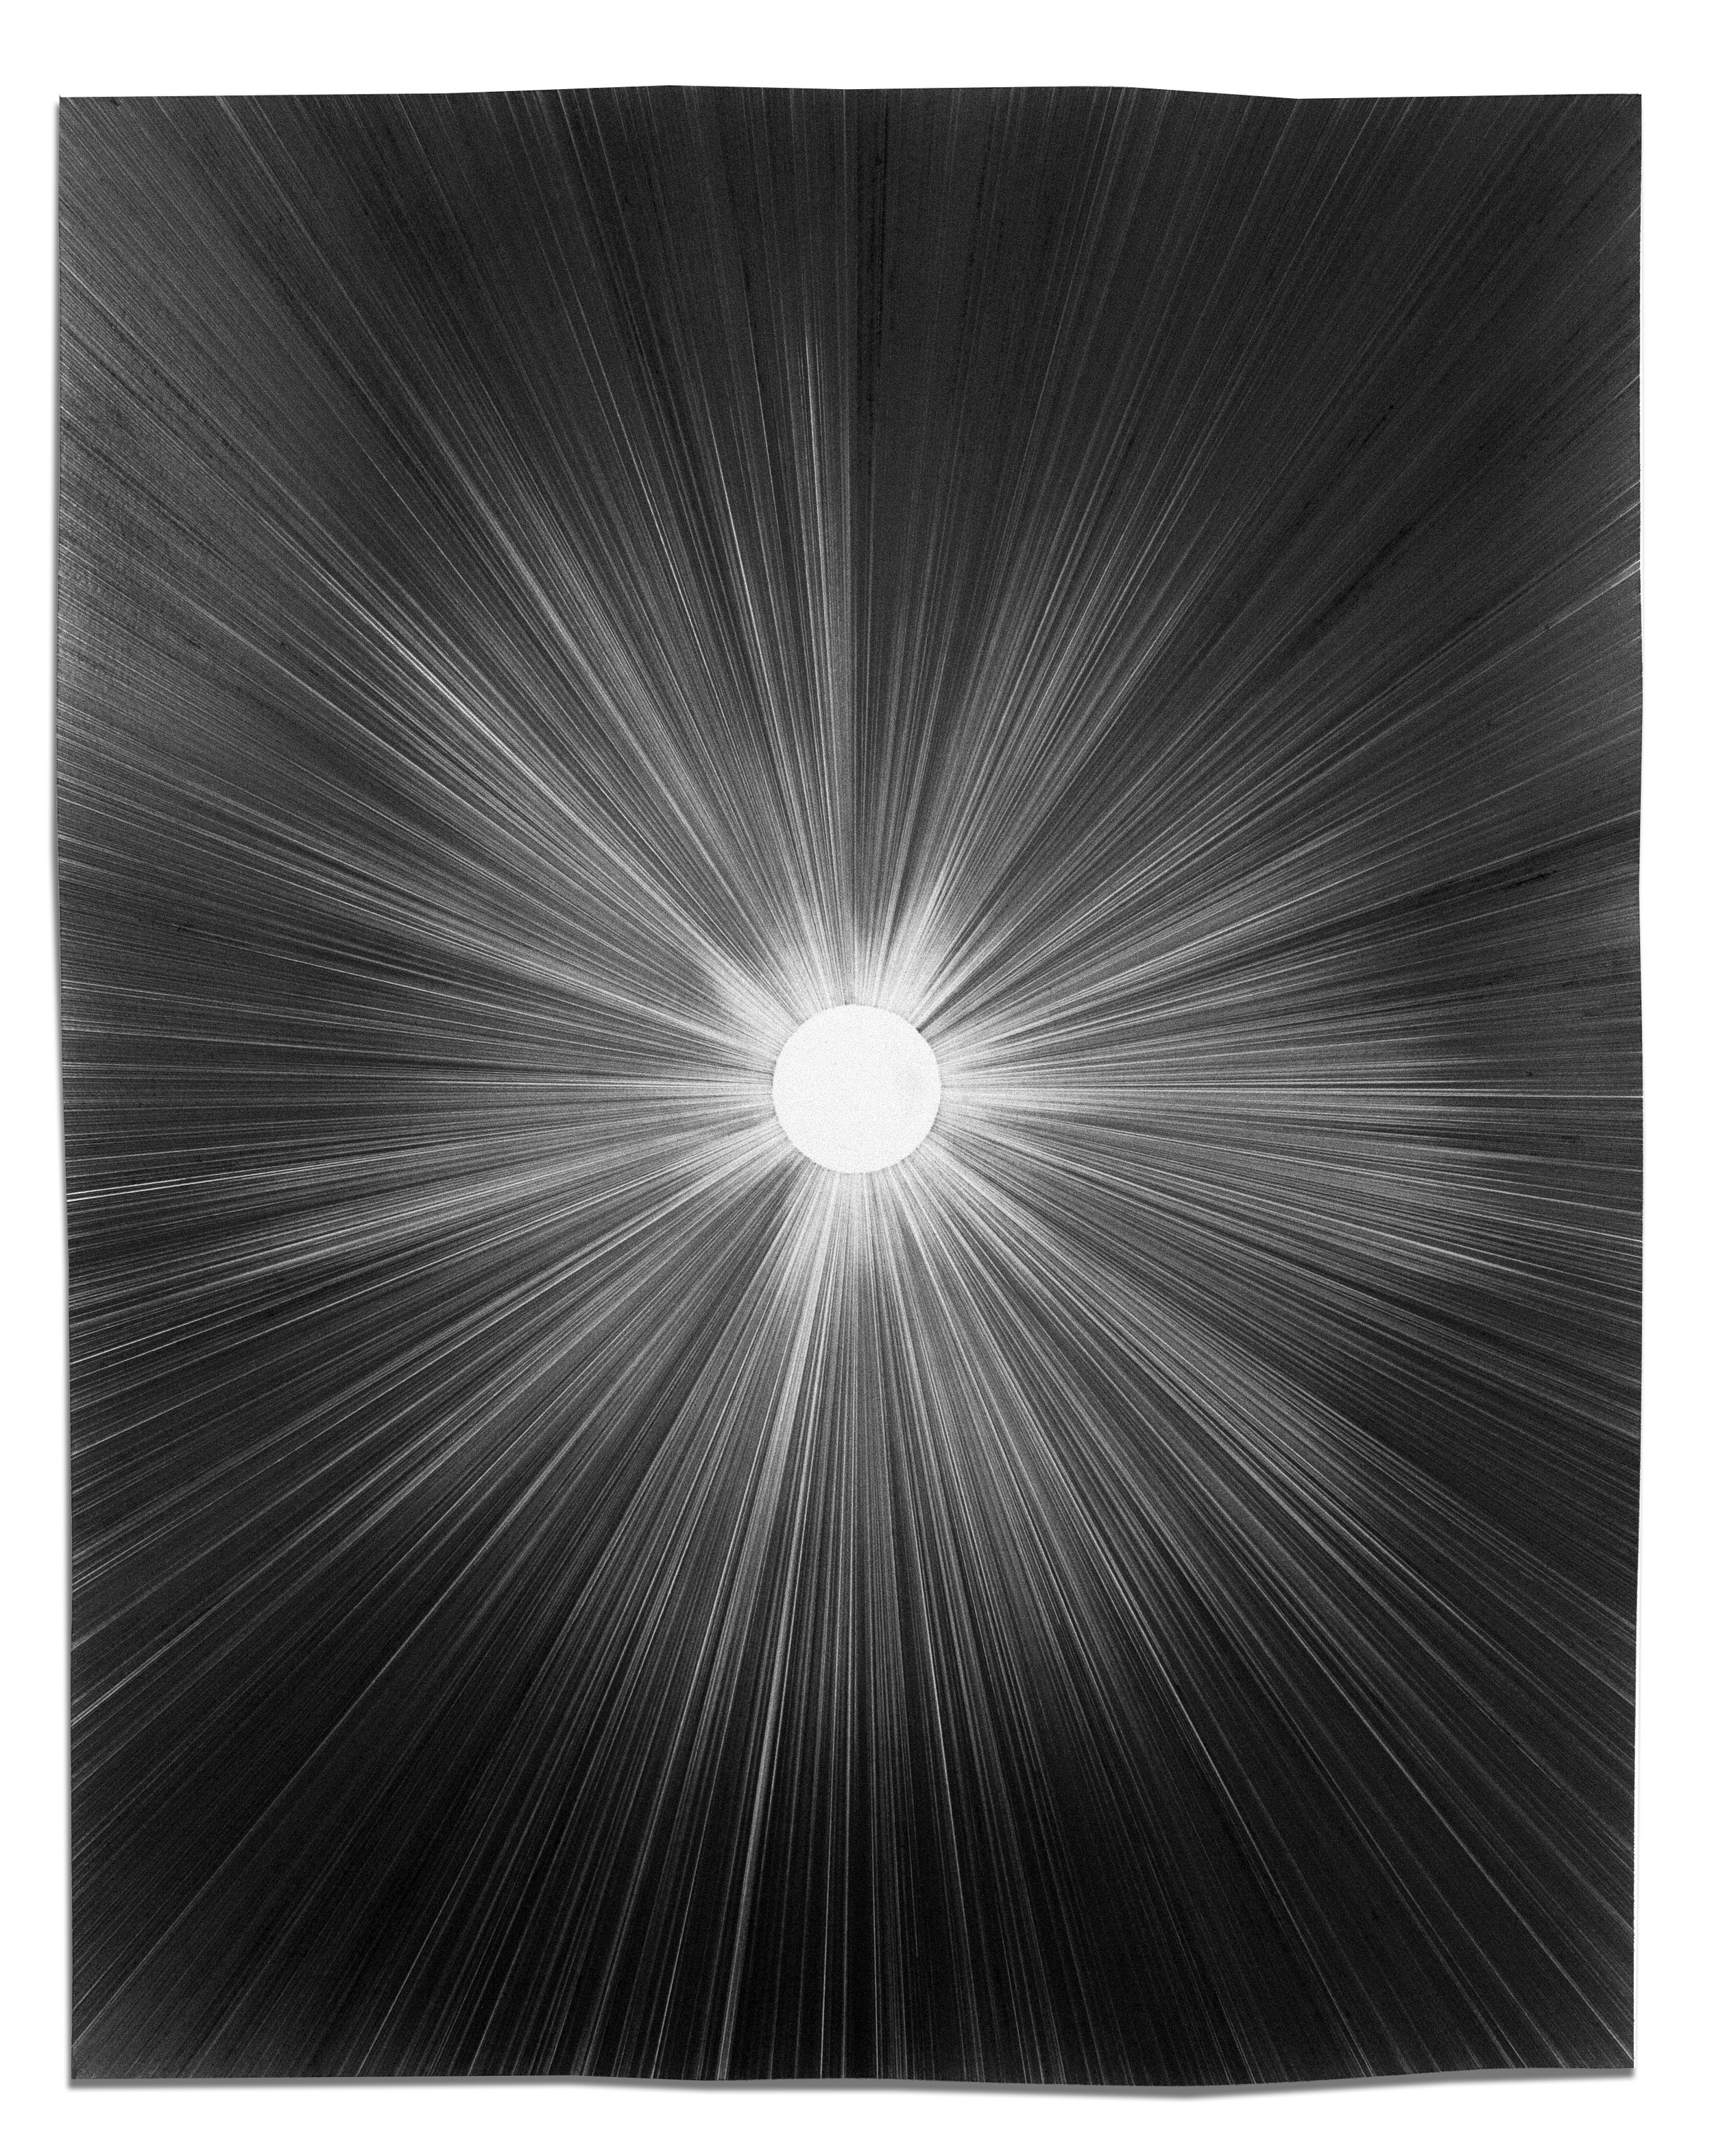 Mass in Black & White No. 2